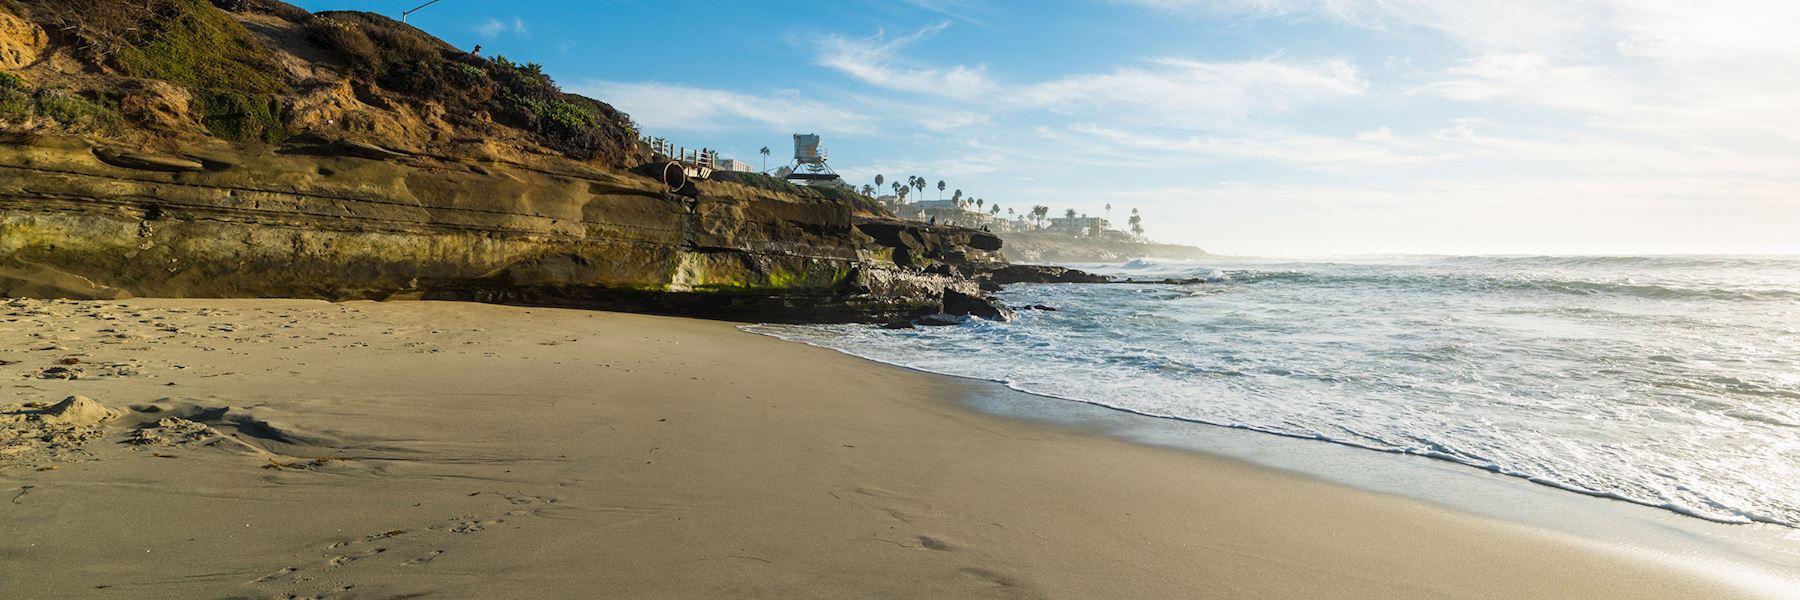 Visit San Diego, California